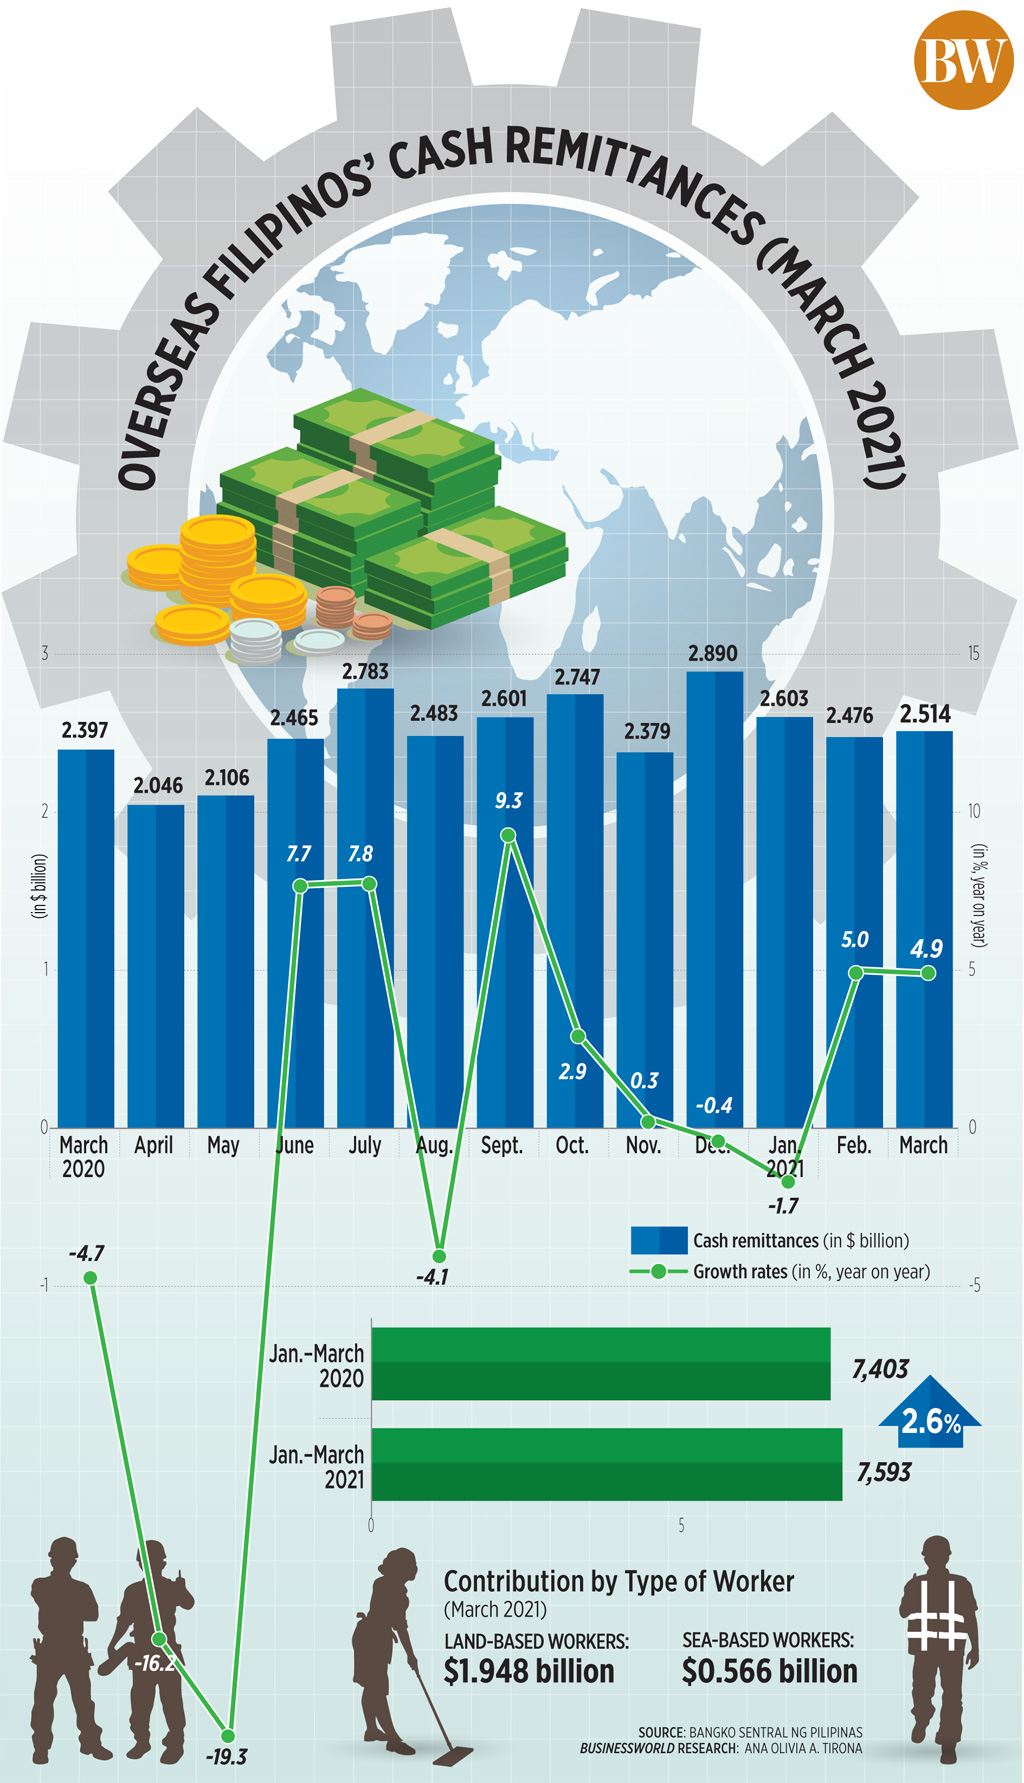 Overseas Filipinos' Cash Remittances (March 2021)